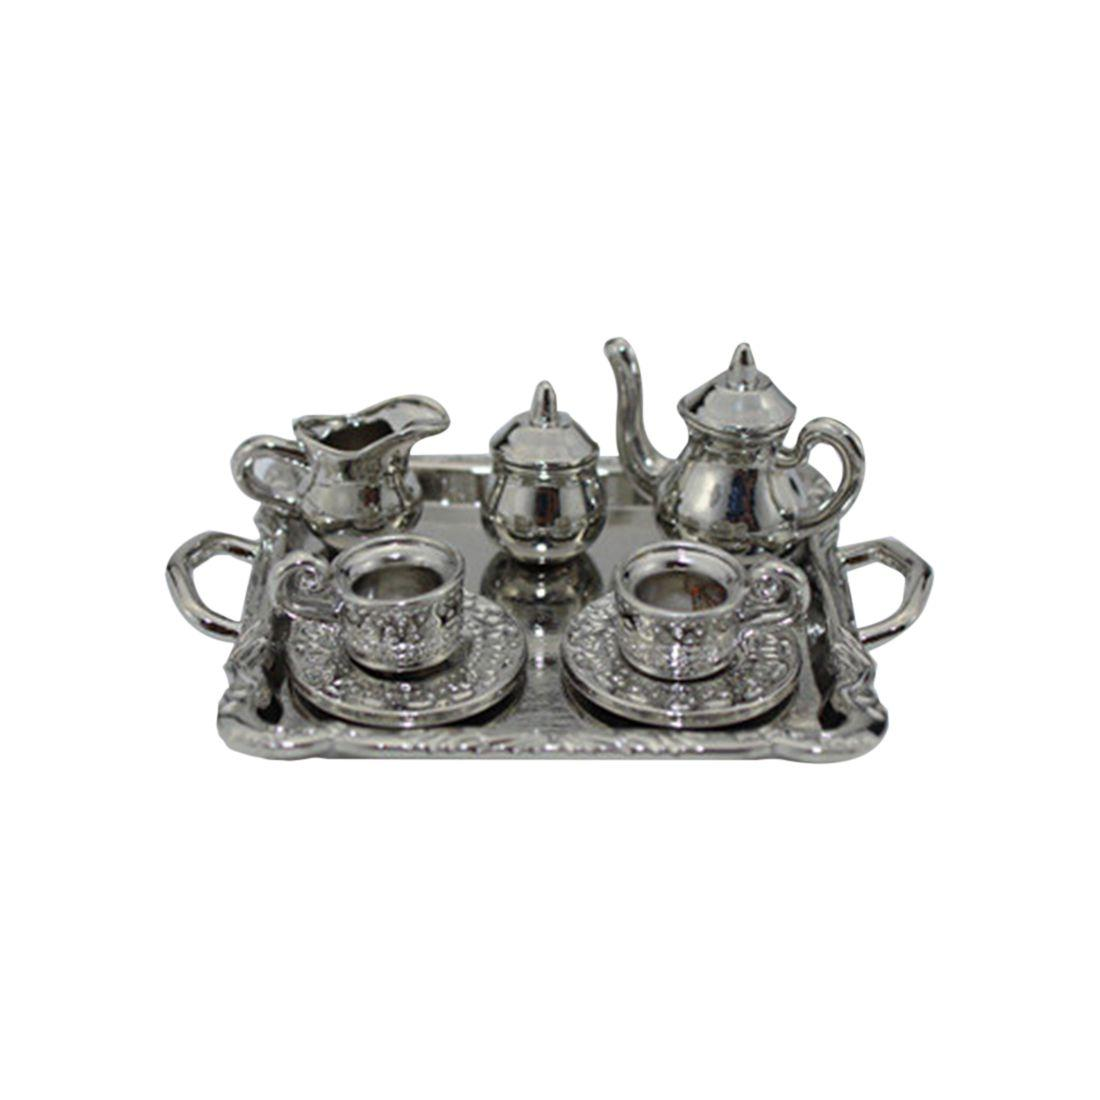 1: 12 Dollhouse móveis em miniatura de jantar Ware Toy 8 Pcs metal Tea Set Bule Copa Placa Comprimento 6,5 centímetros